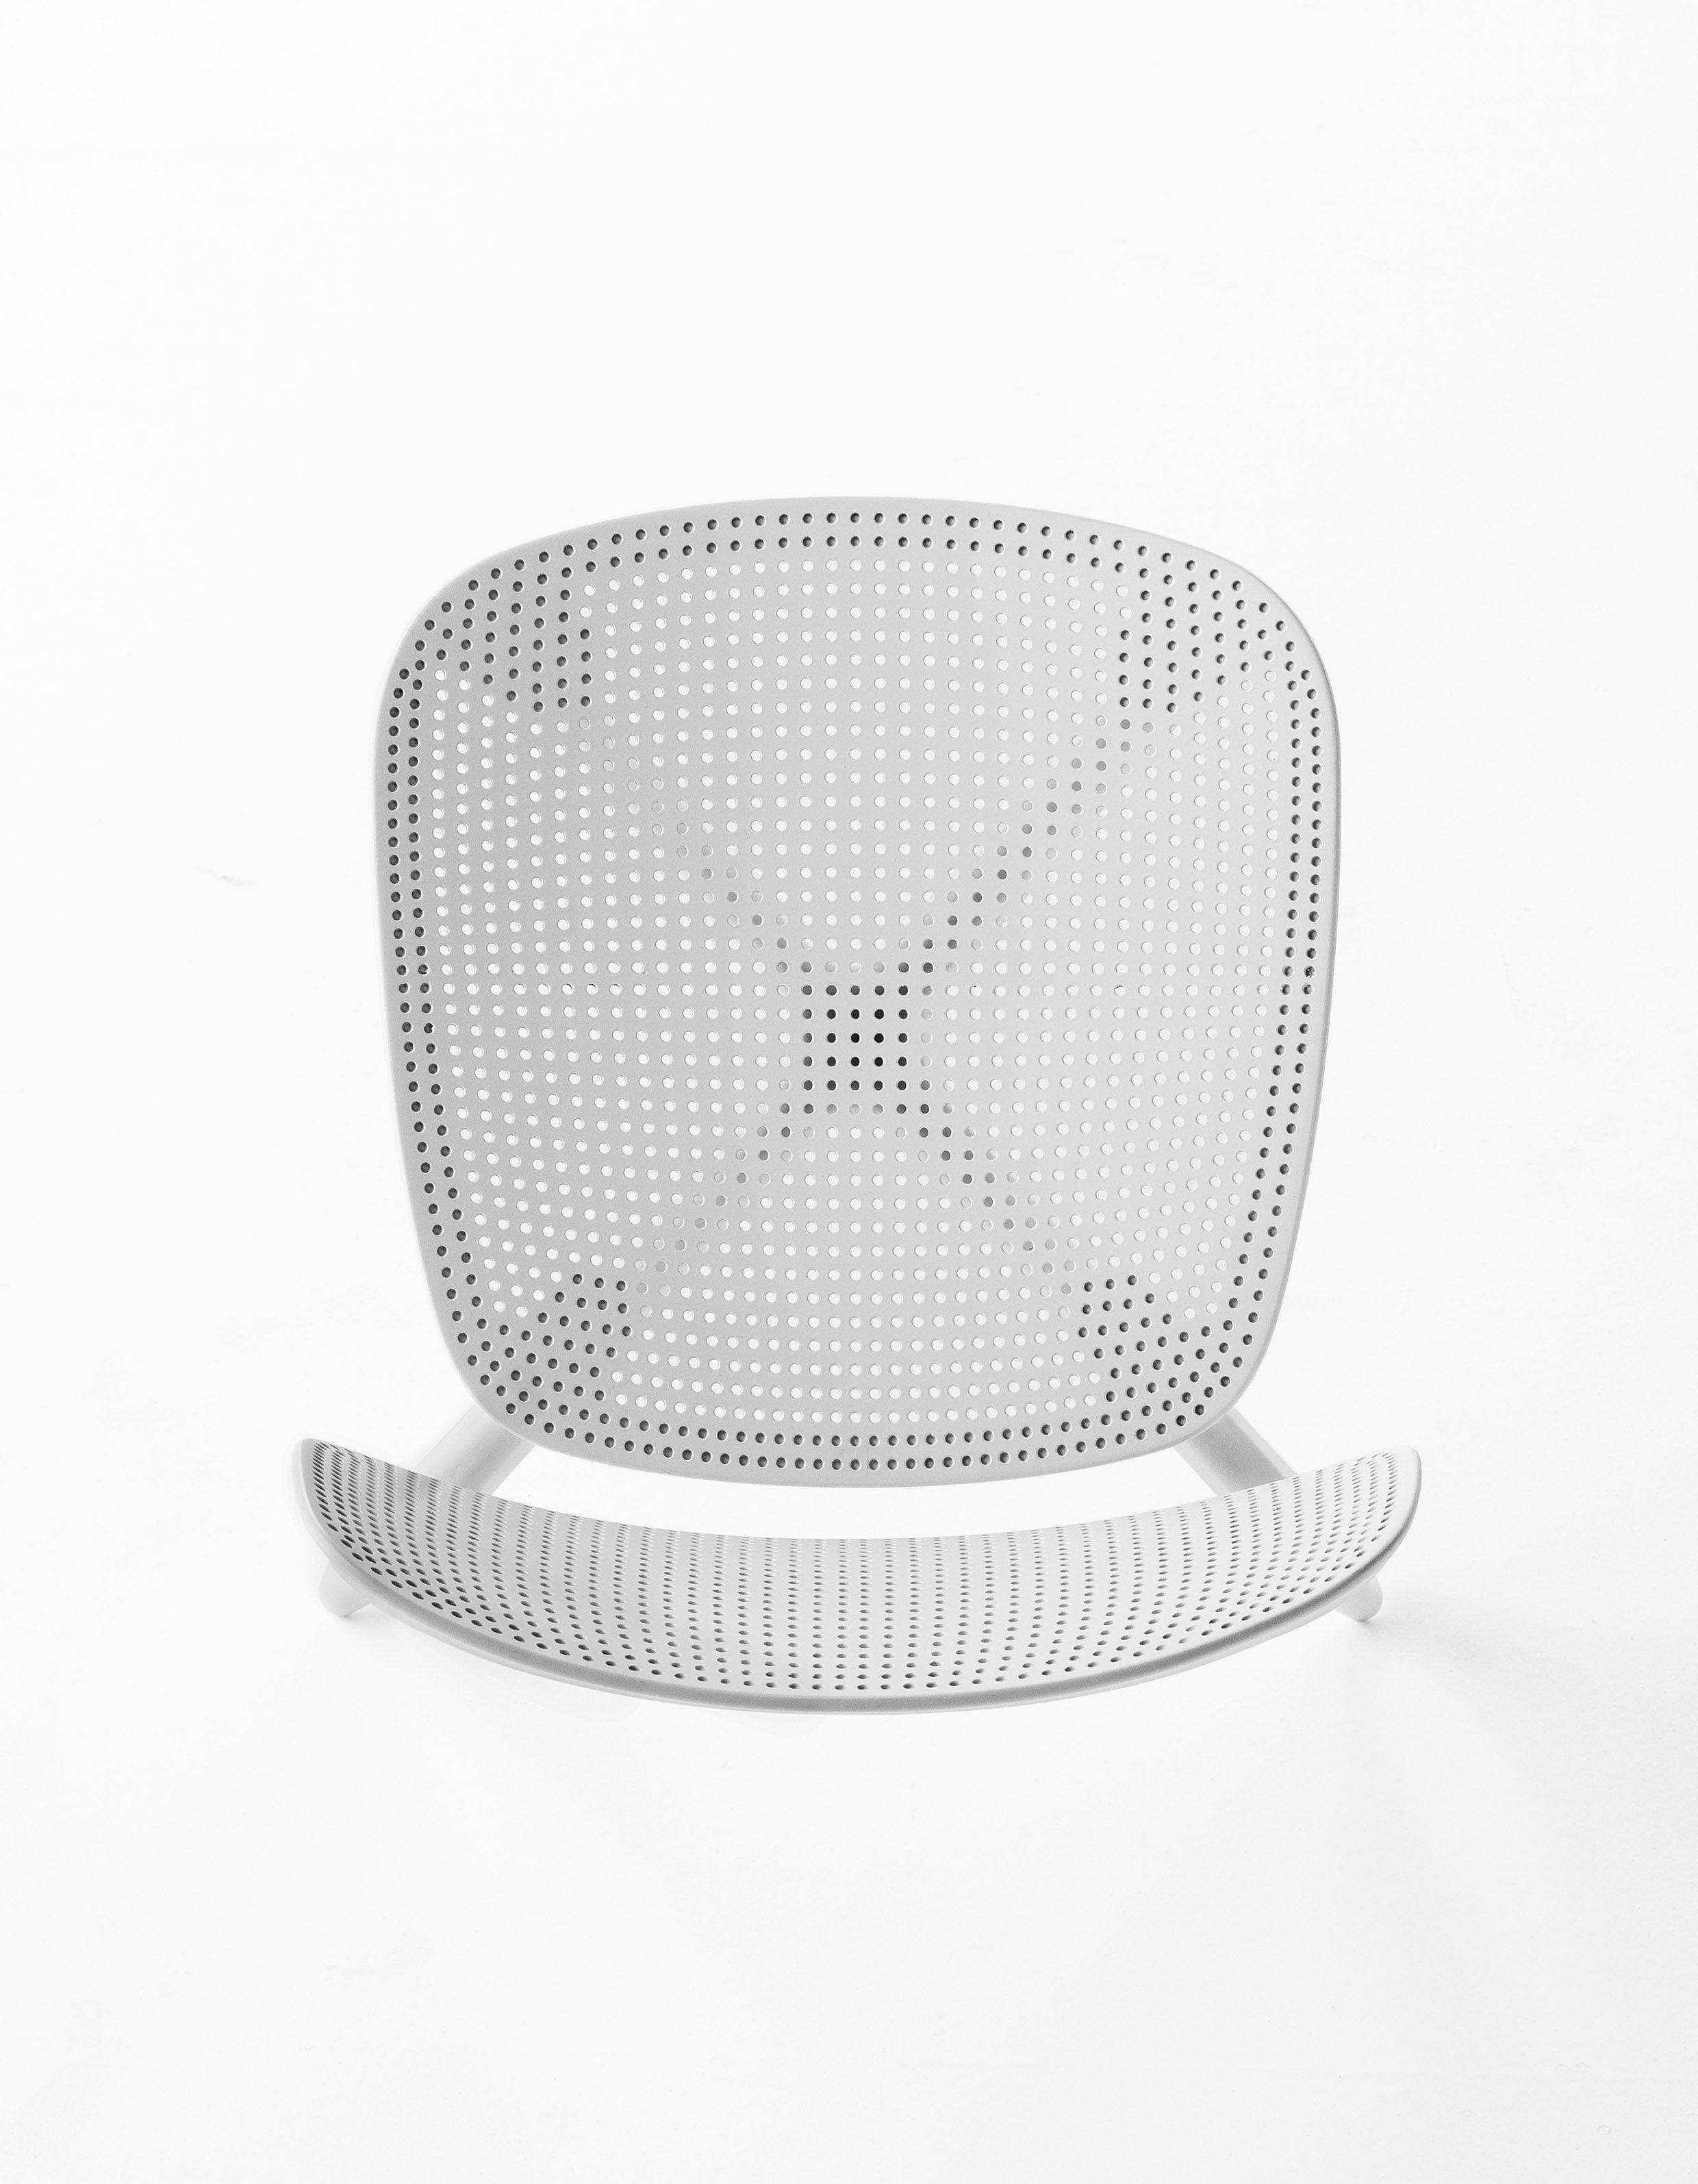 Colander, Minimalistic Chair In White | Chair . Stuhl . Chaise | Design:  Patrick